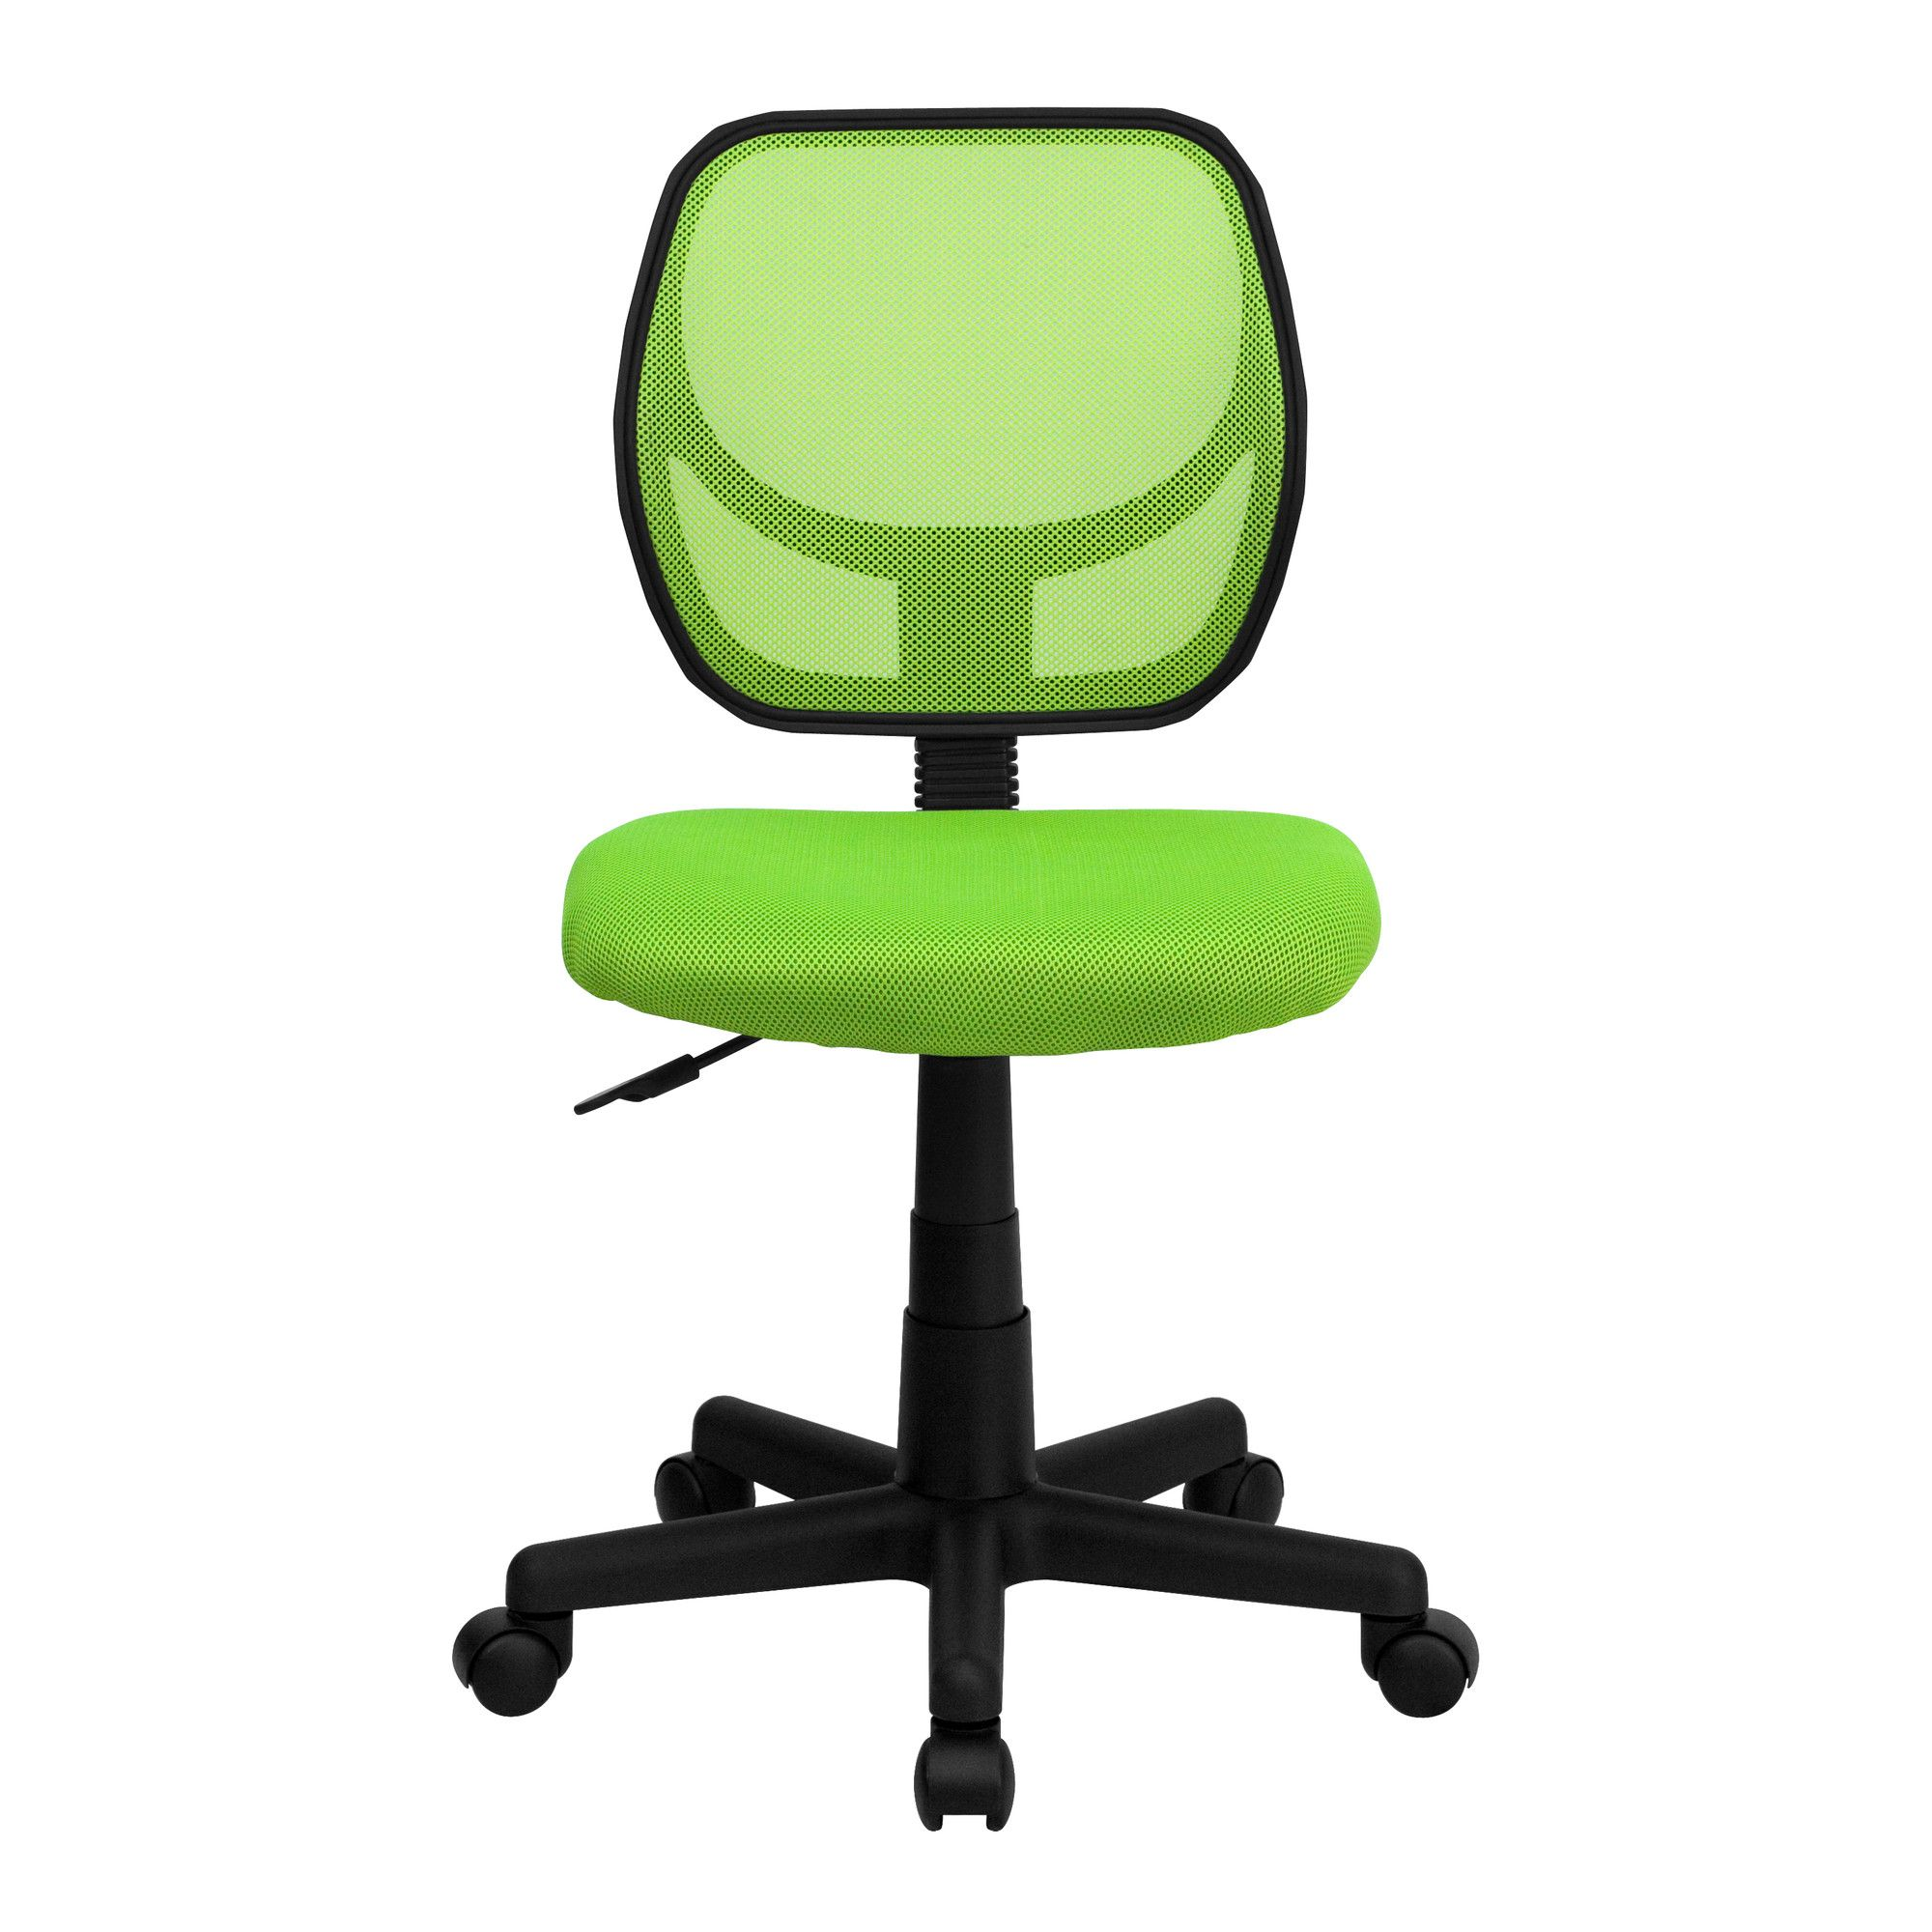 Flashfurniture midback mesh task chair reviews